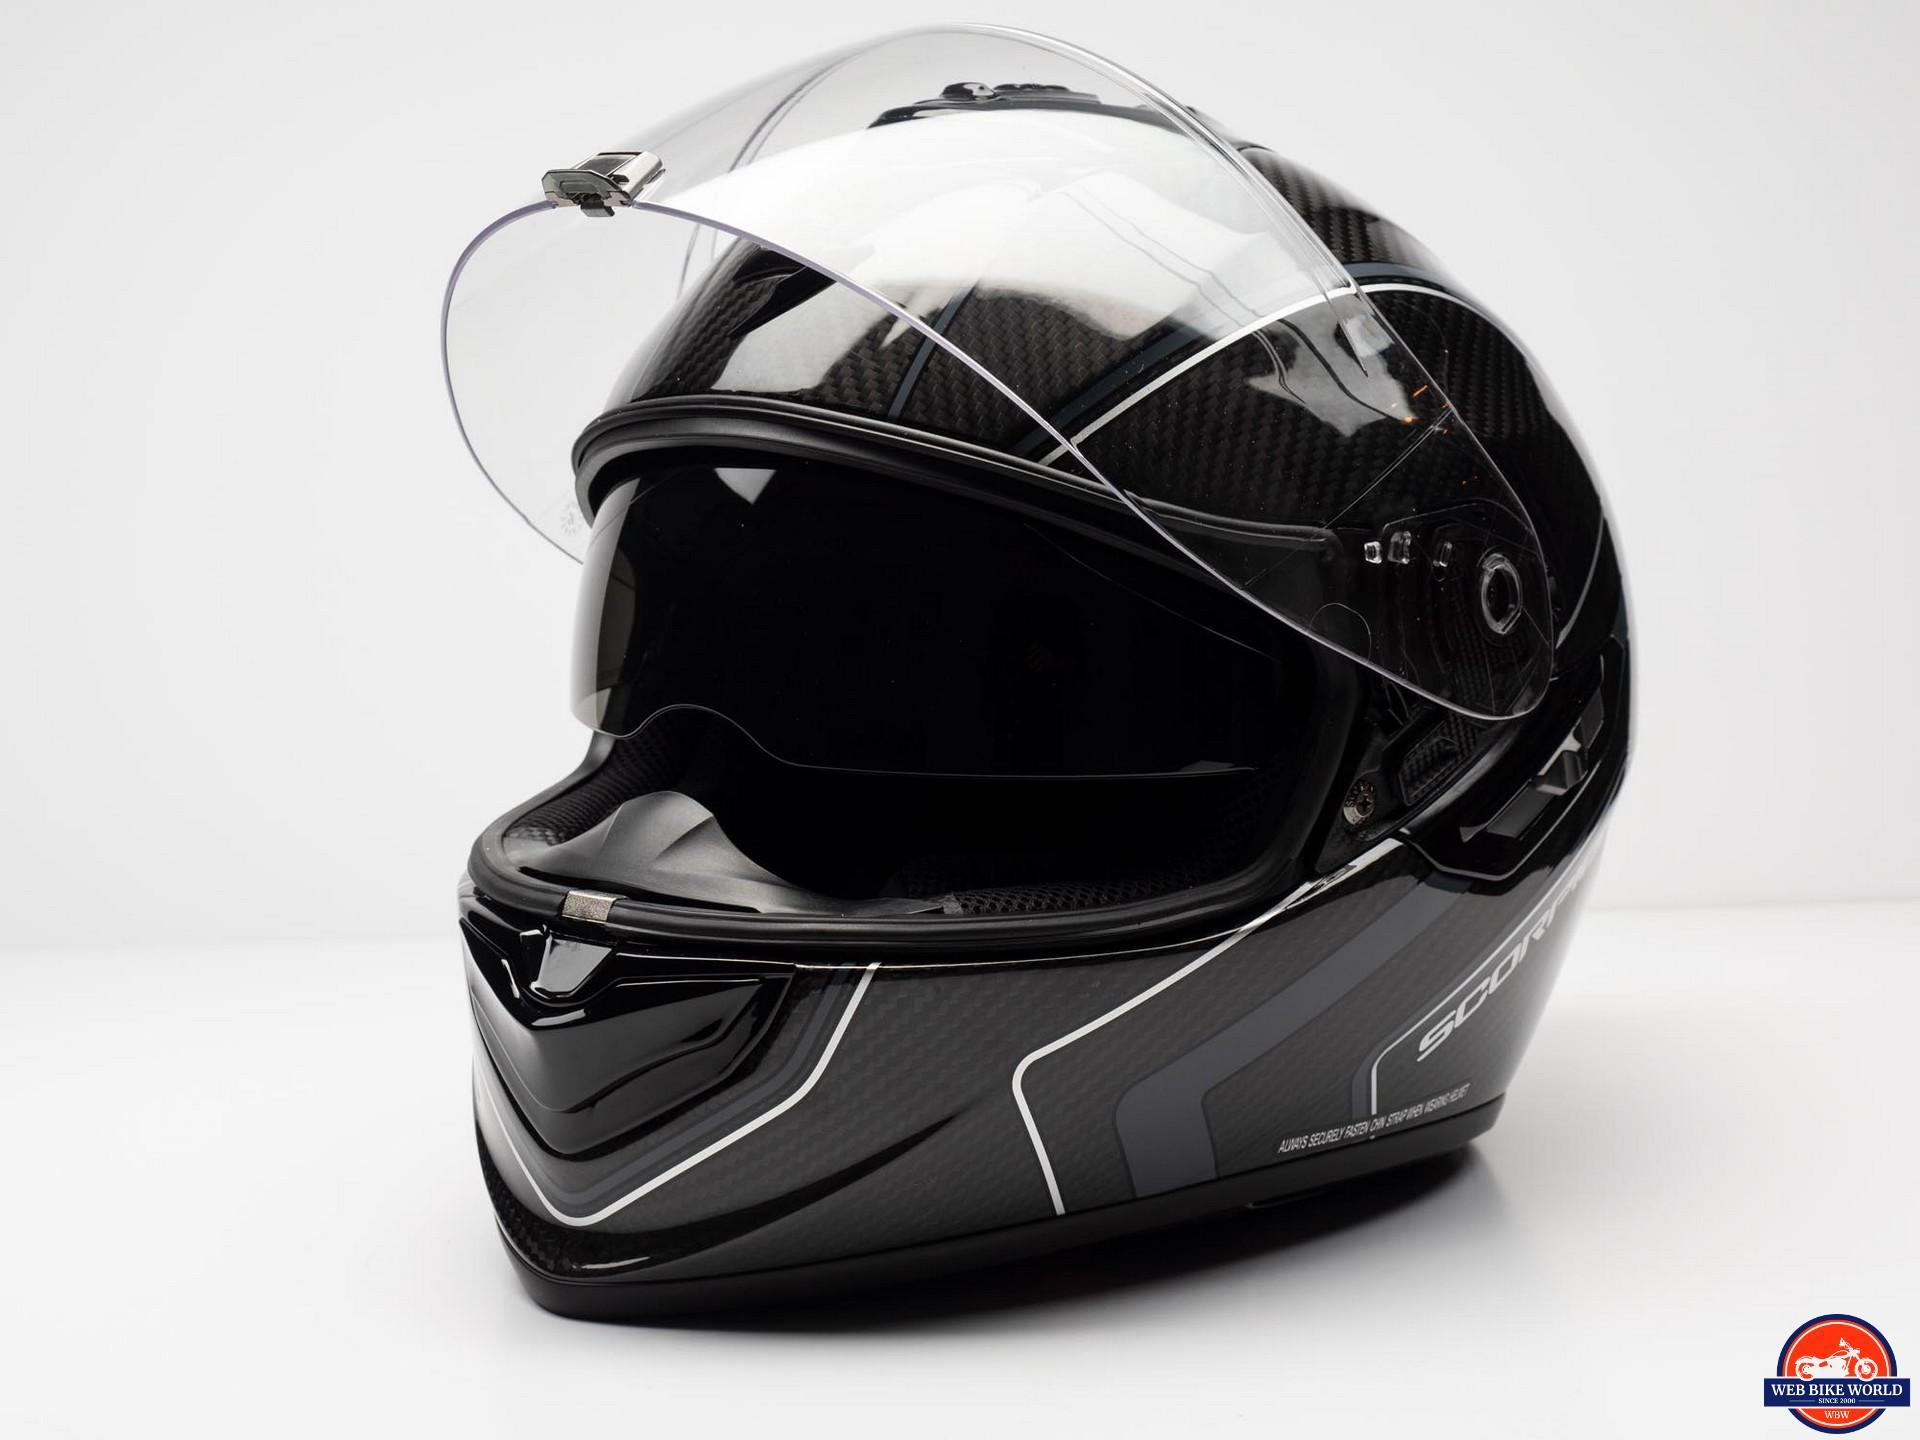 8a109654 Scorpion EXO-ST1400 Carbon Helmet visor up